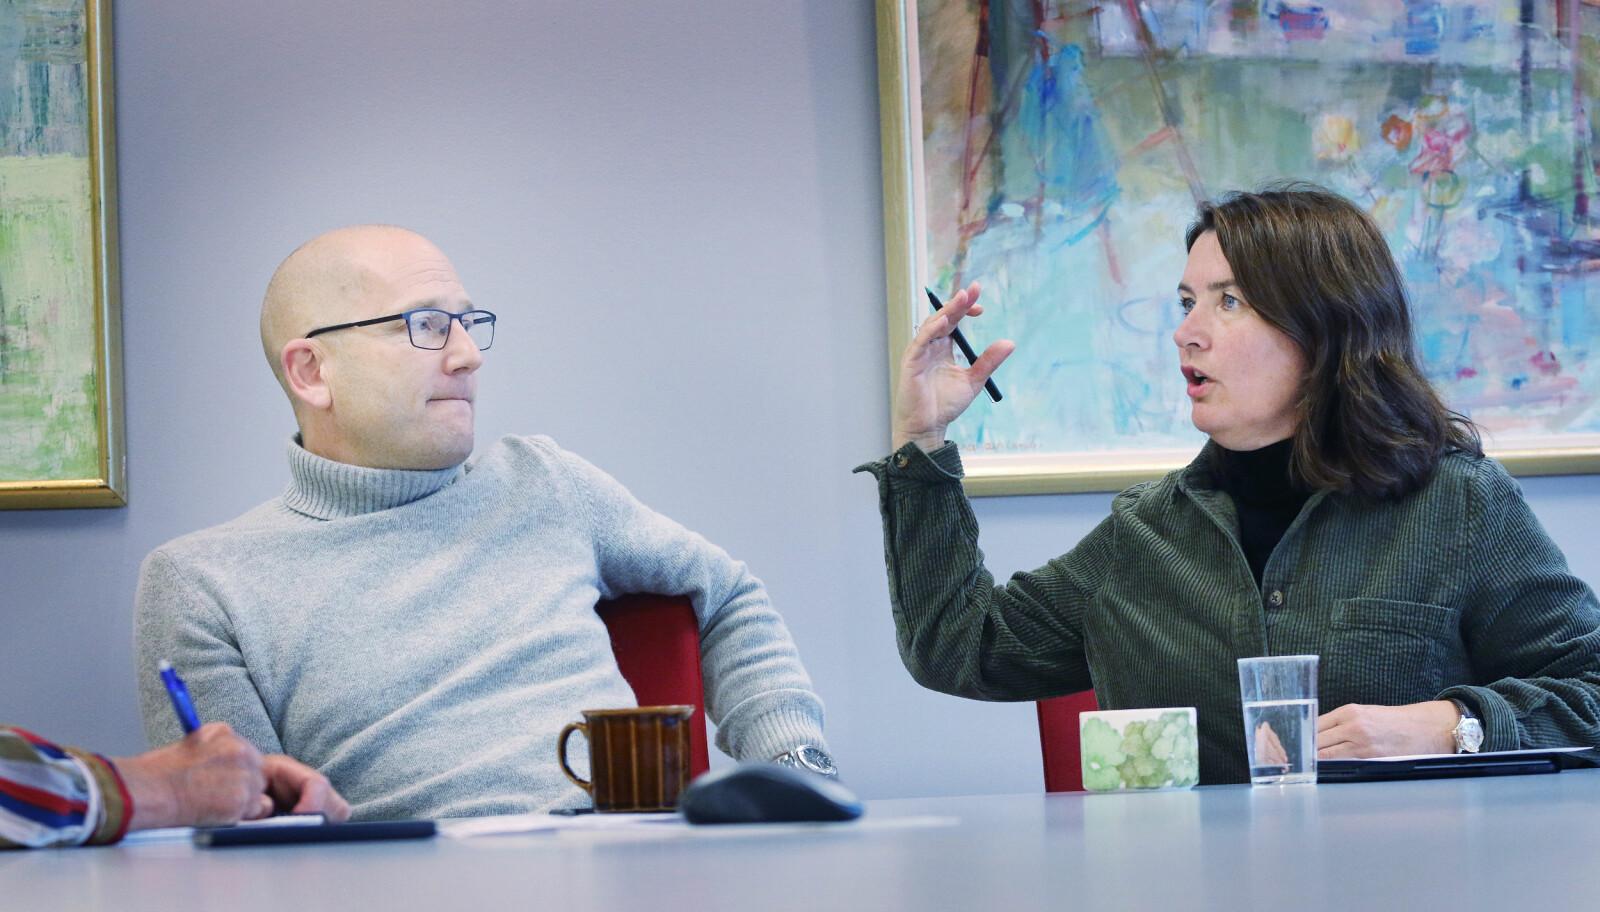 Leder i Utdanningsforbundet Steffen Handal og nestleder Hege Valås er klare på at de ønsker mer debatt internt i forbundet. Foto: Jørgen Jelstad